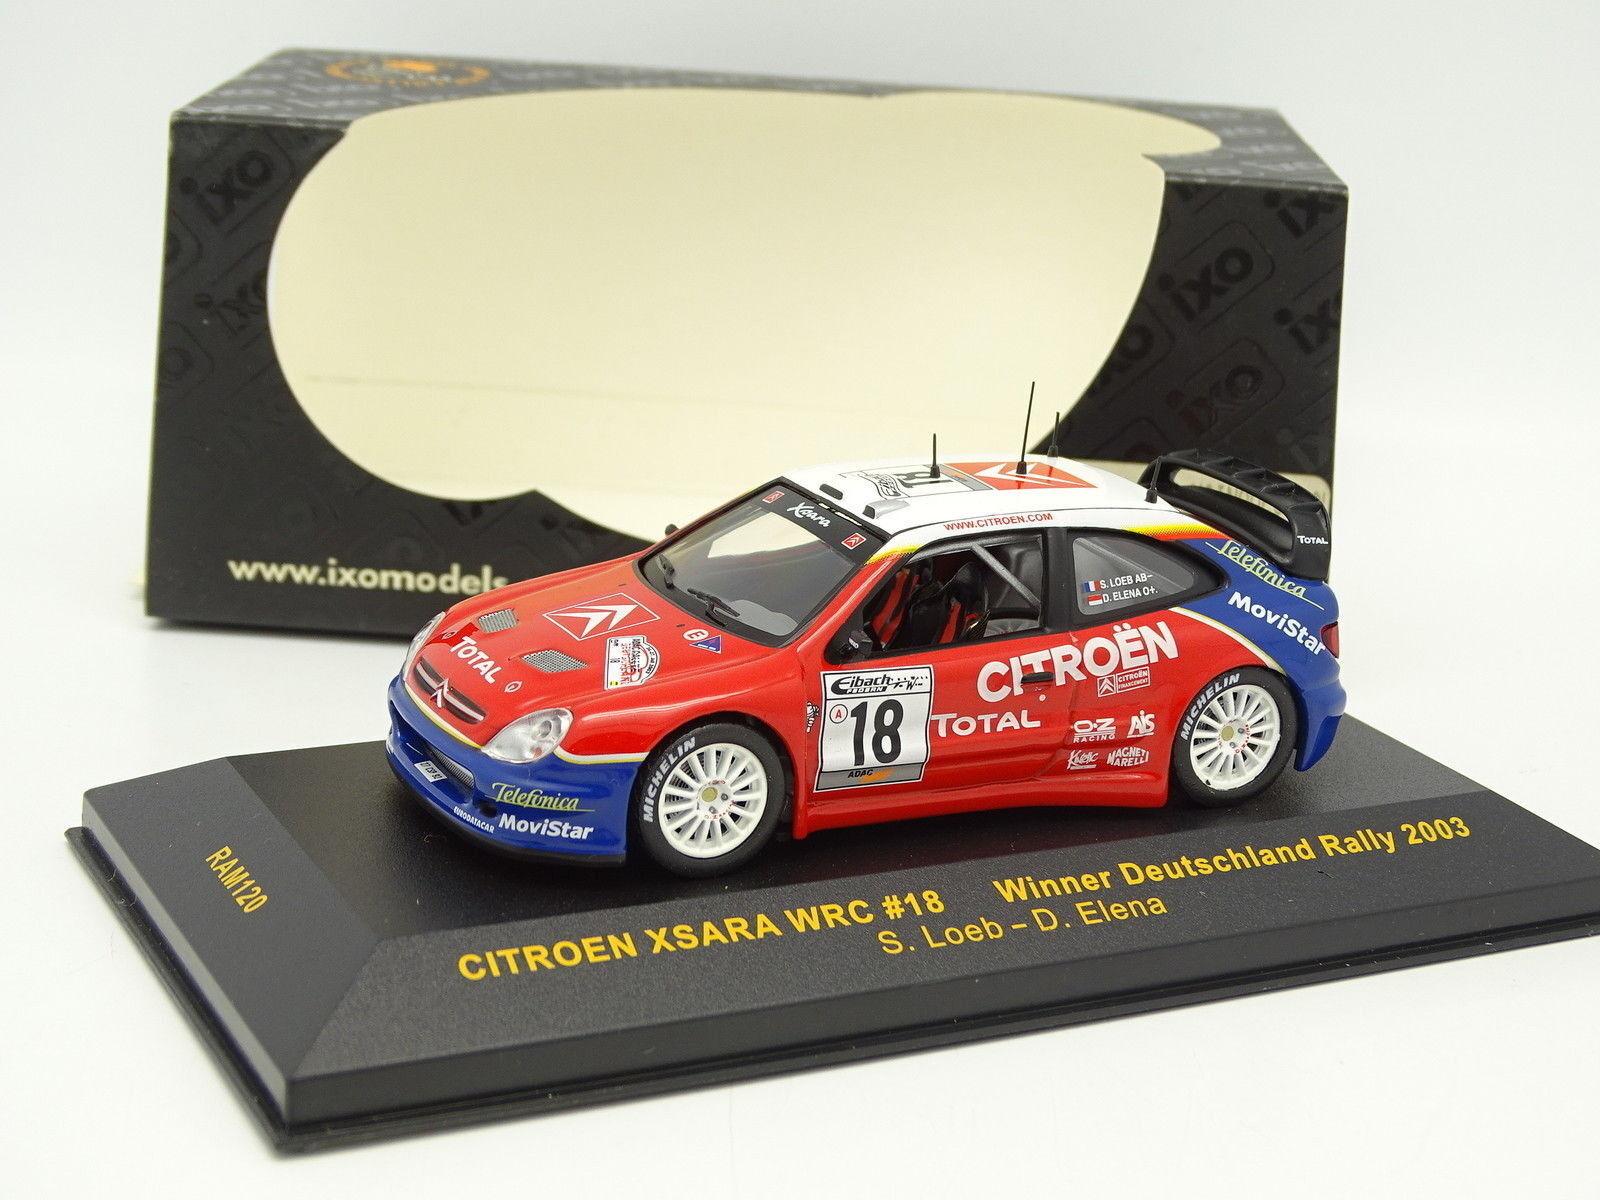 Ixo 1 43 - Citroen Xsara Xsara Xsara WRC Nr.18 Loeb Winner Deutschland Rally 2003 af2798